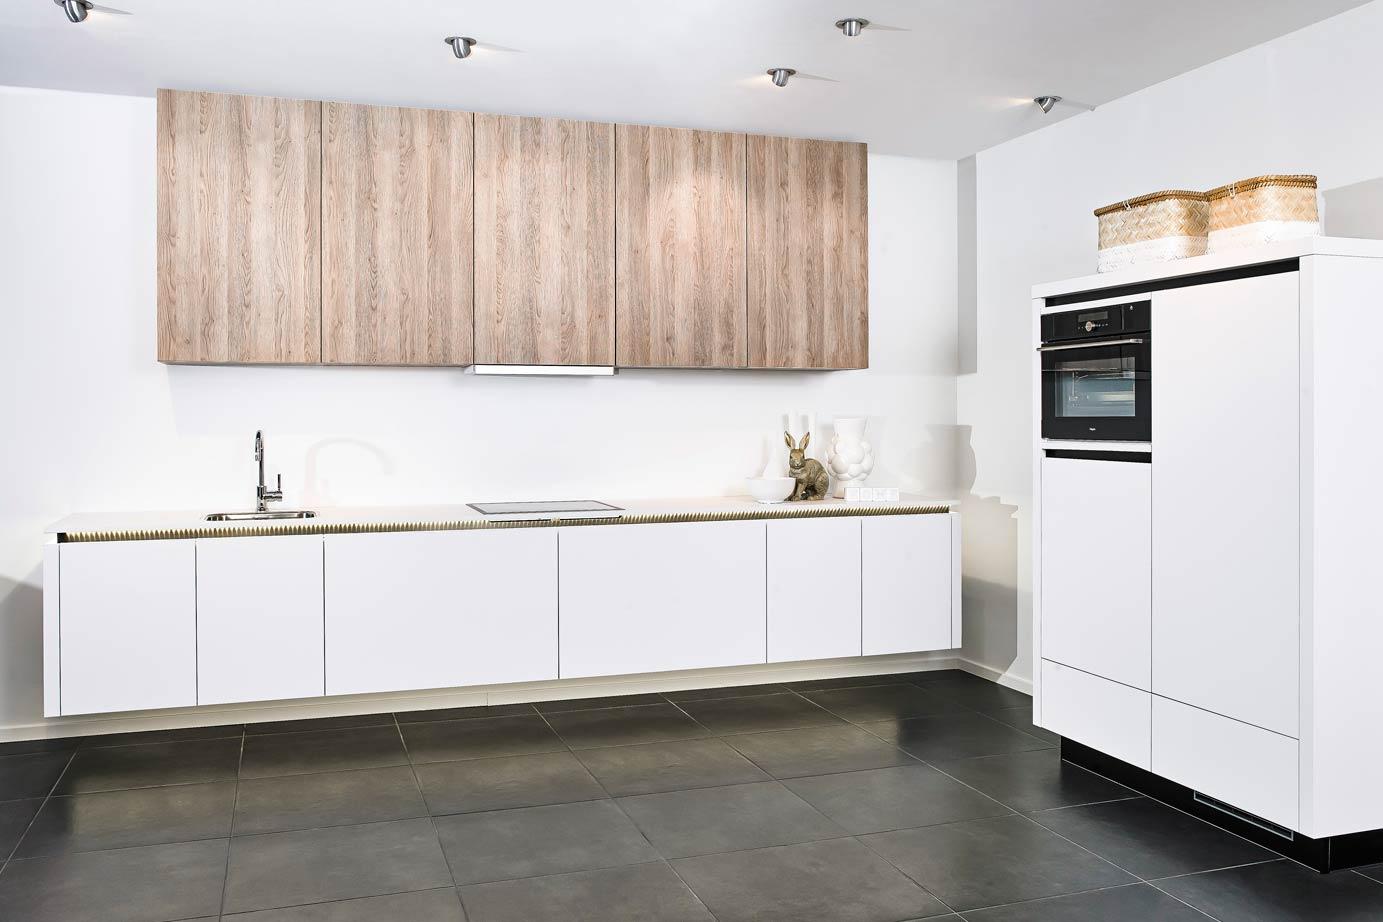 Kastenwand Keuken Moderne : Moderne witte keuken met kastenwand db keukens